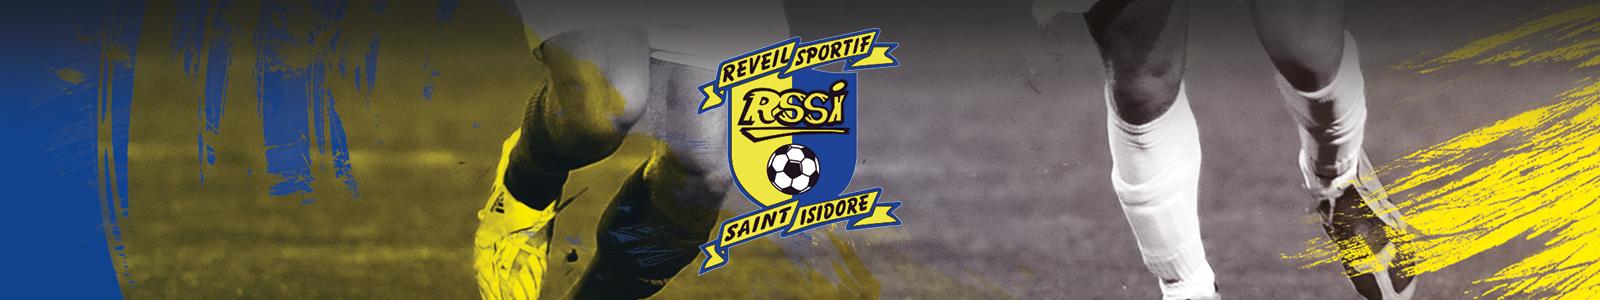 Réveil Sportif Saint-Isidore : site officiel du club de foot de ST ISIDORE - footeo